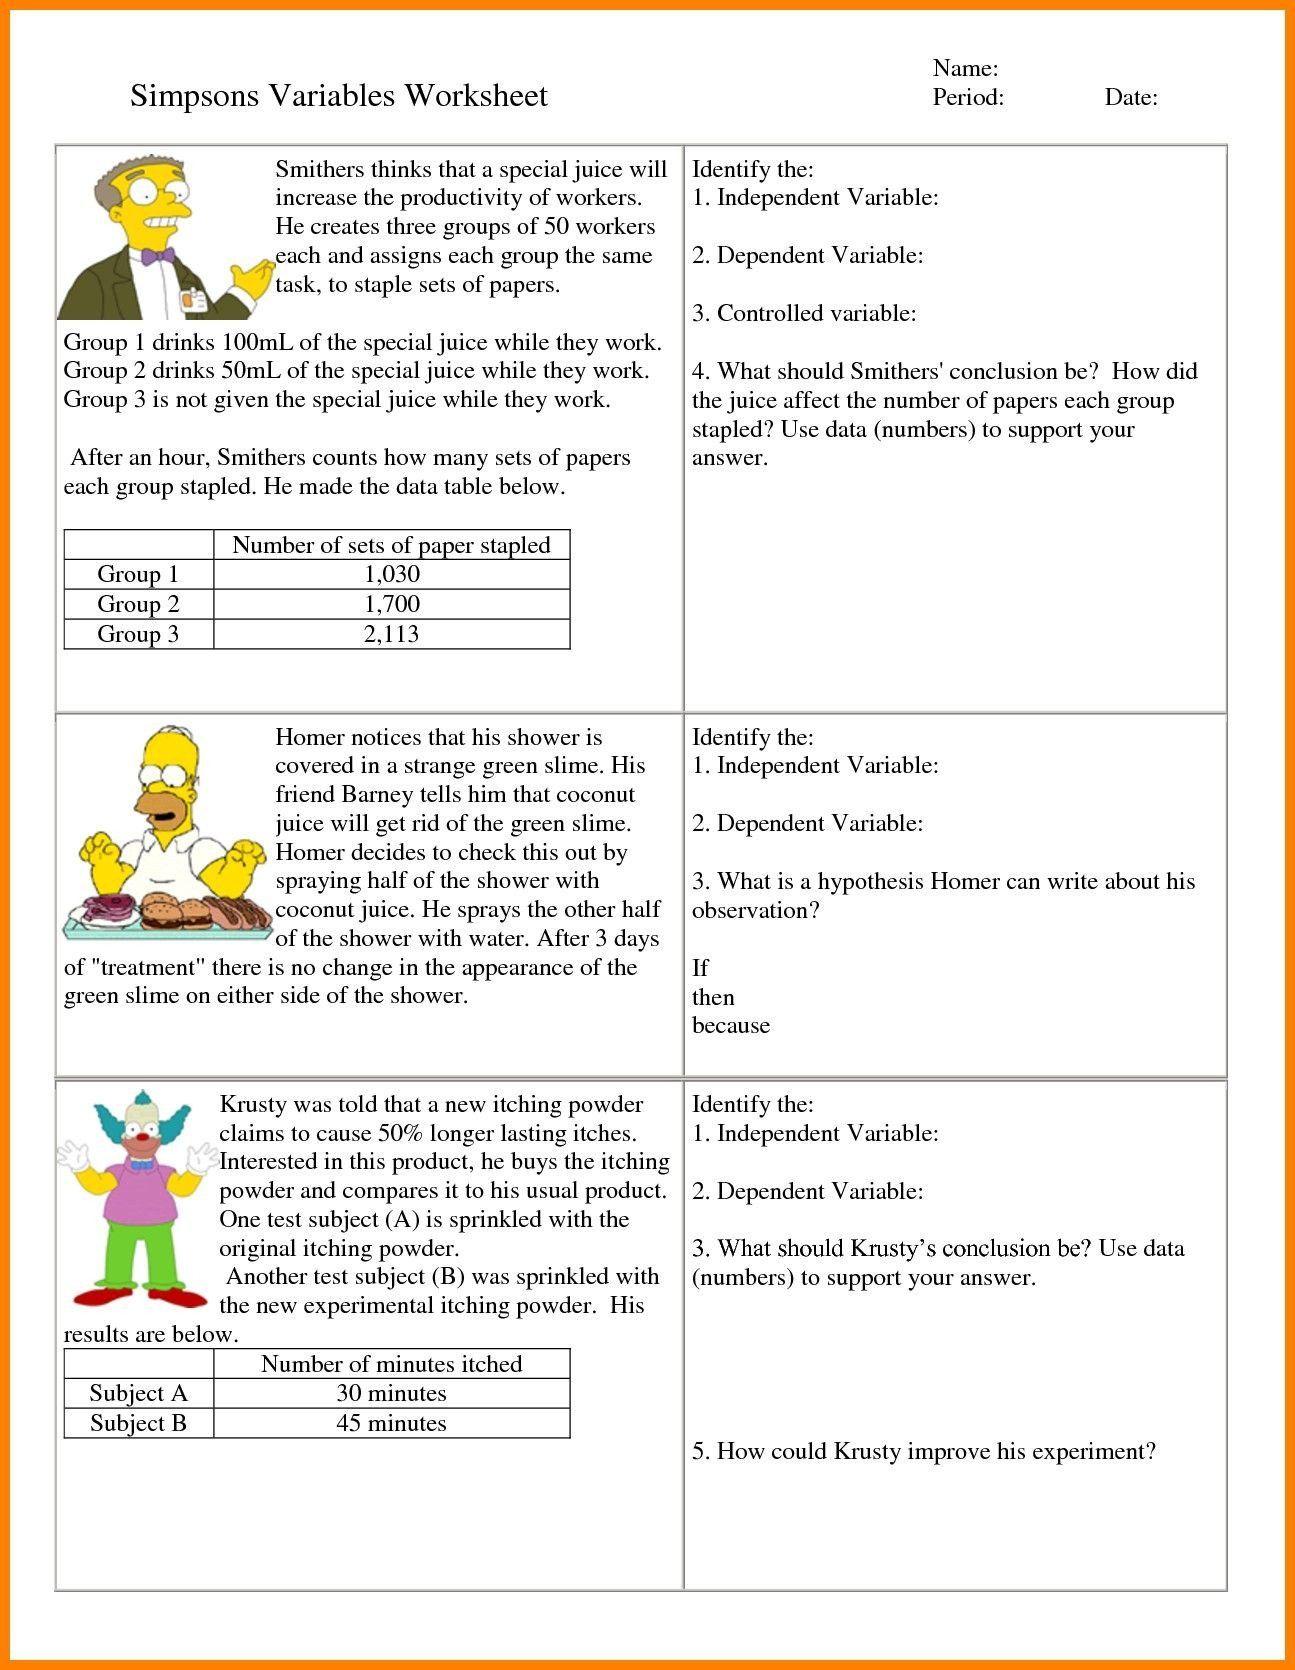 Dependent And Independent Variables Worksheet 6th Grade Hypothesis Worksheet Refrence 7 I In 2020 Scientific Method Worksheet Probability Worksheets Science Worksheets